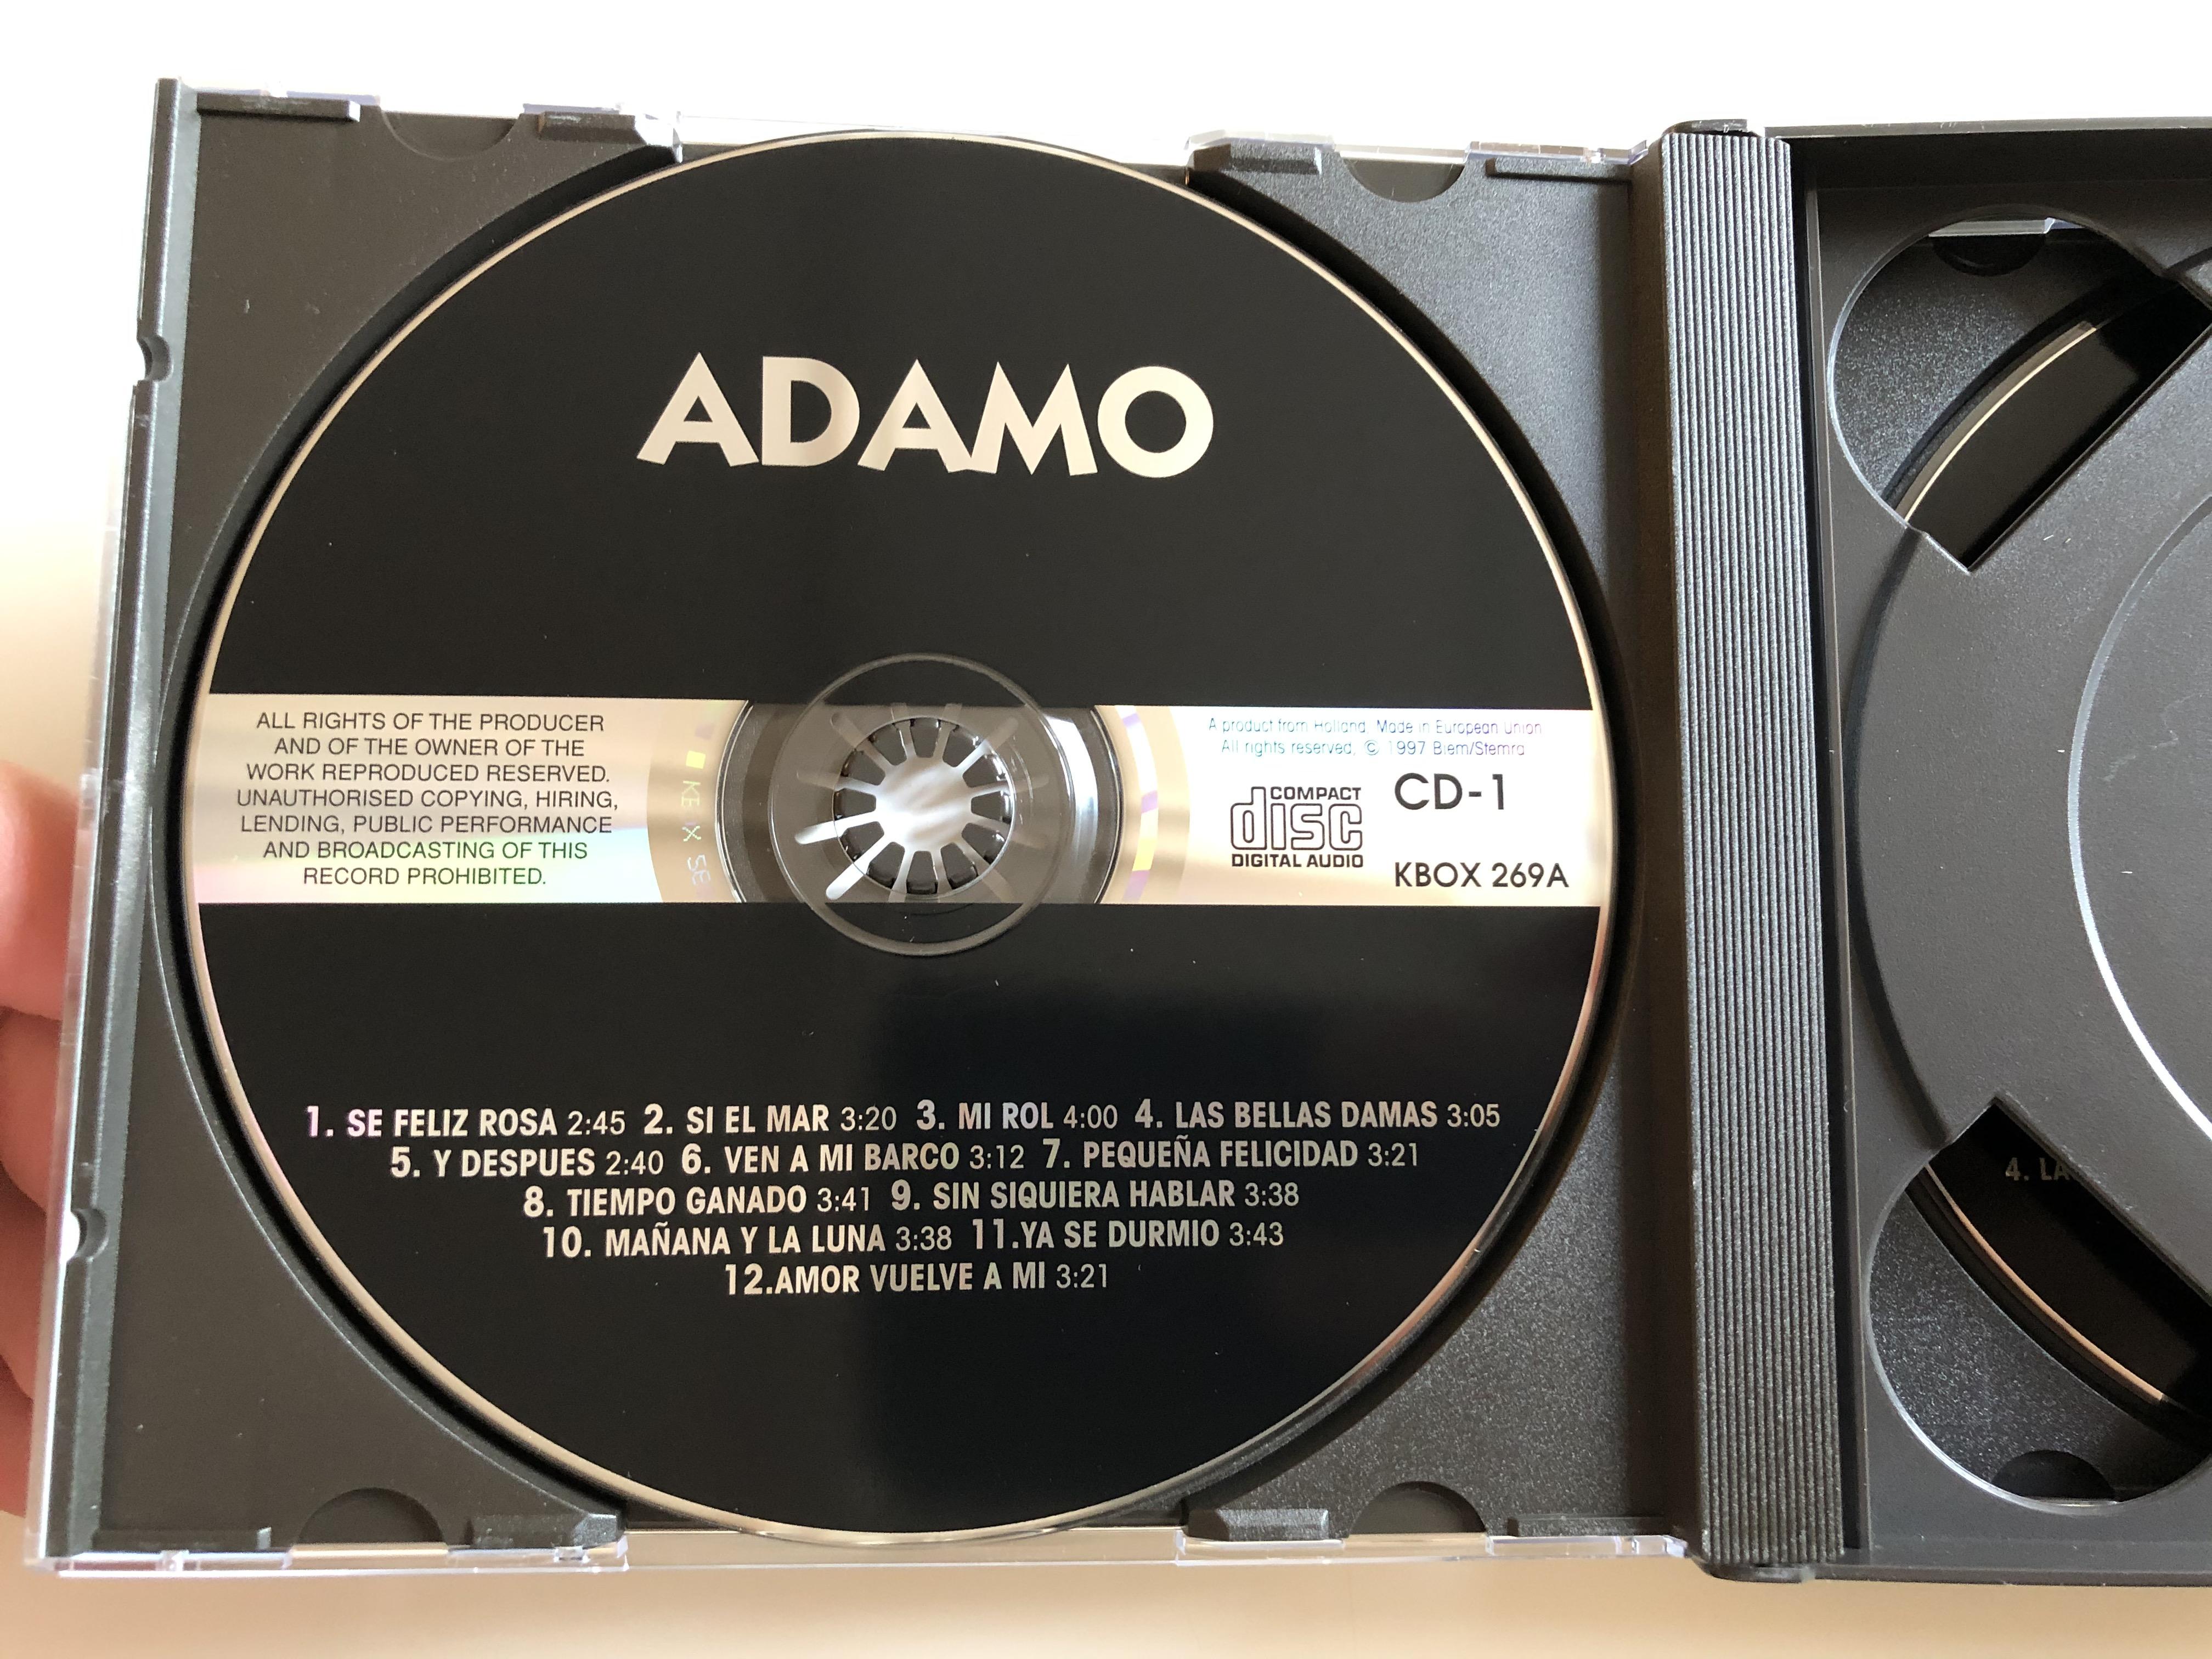 adamo-la-noche-las-joyas-tu-nombre-se-feliz-rosa-ya-se-durmio-sin-siquiera-hablar-biemstemra-2x-audio-cd-1997-kbox-269-2-.jpg